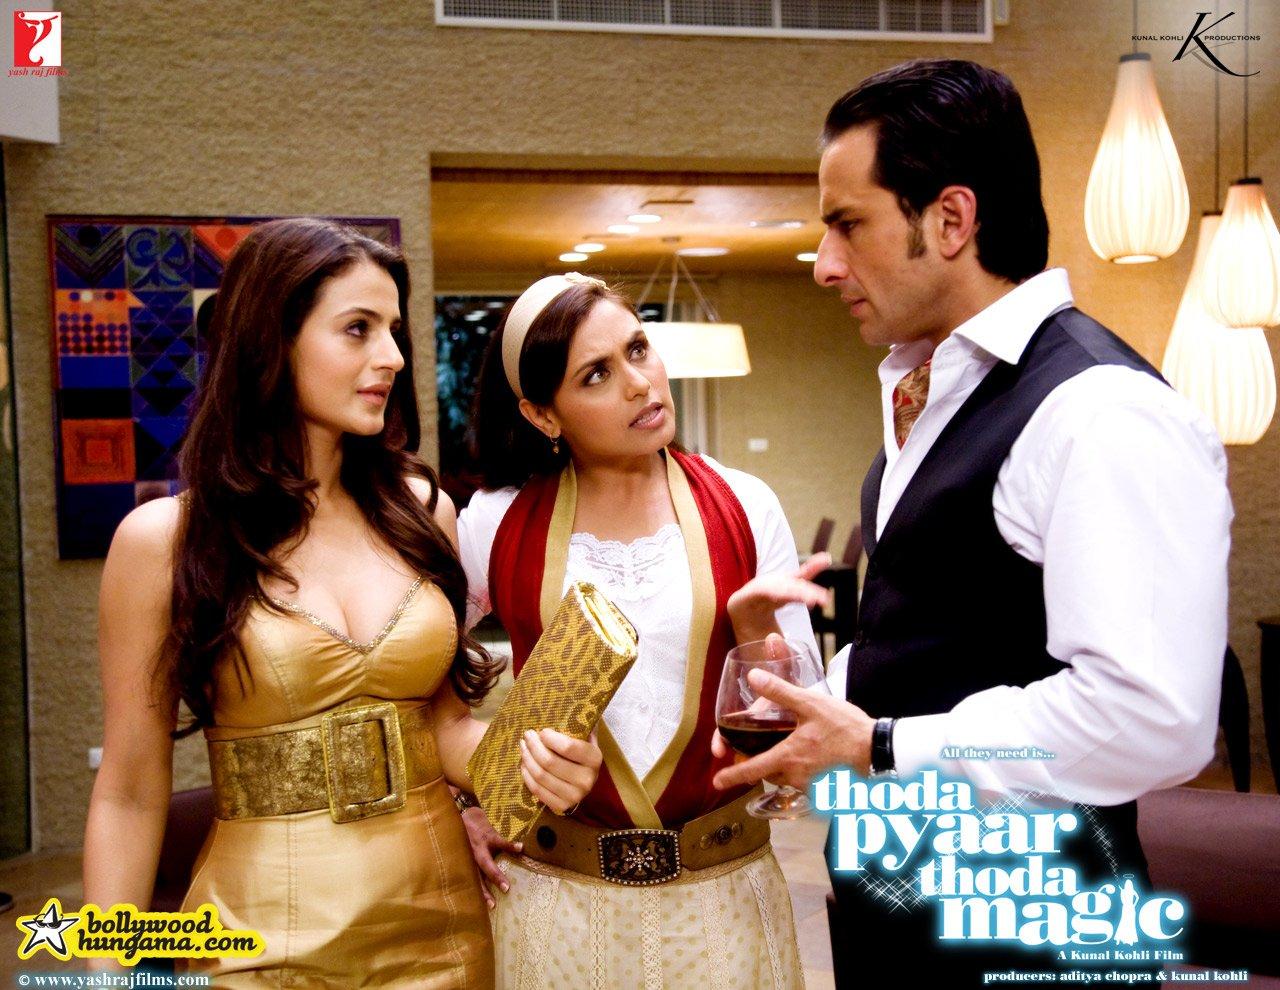 http://i.indiafm.com/posters/movies/08/thodapyaarthodamagic/still26.jpg